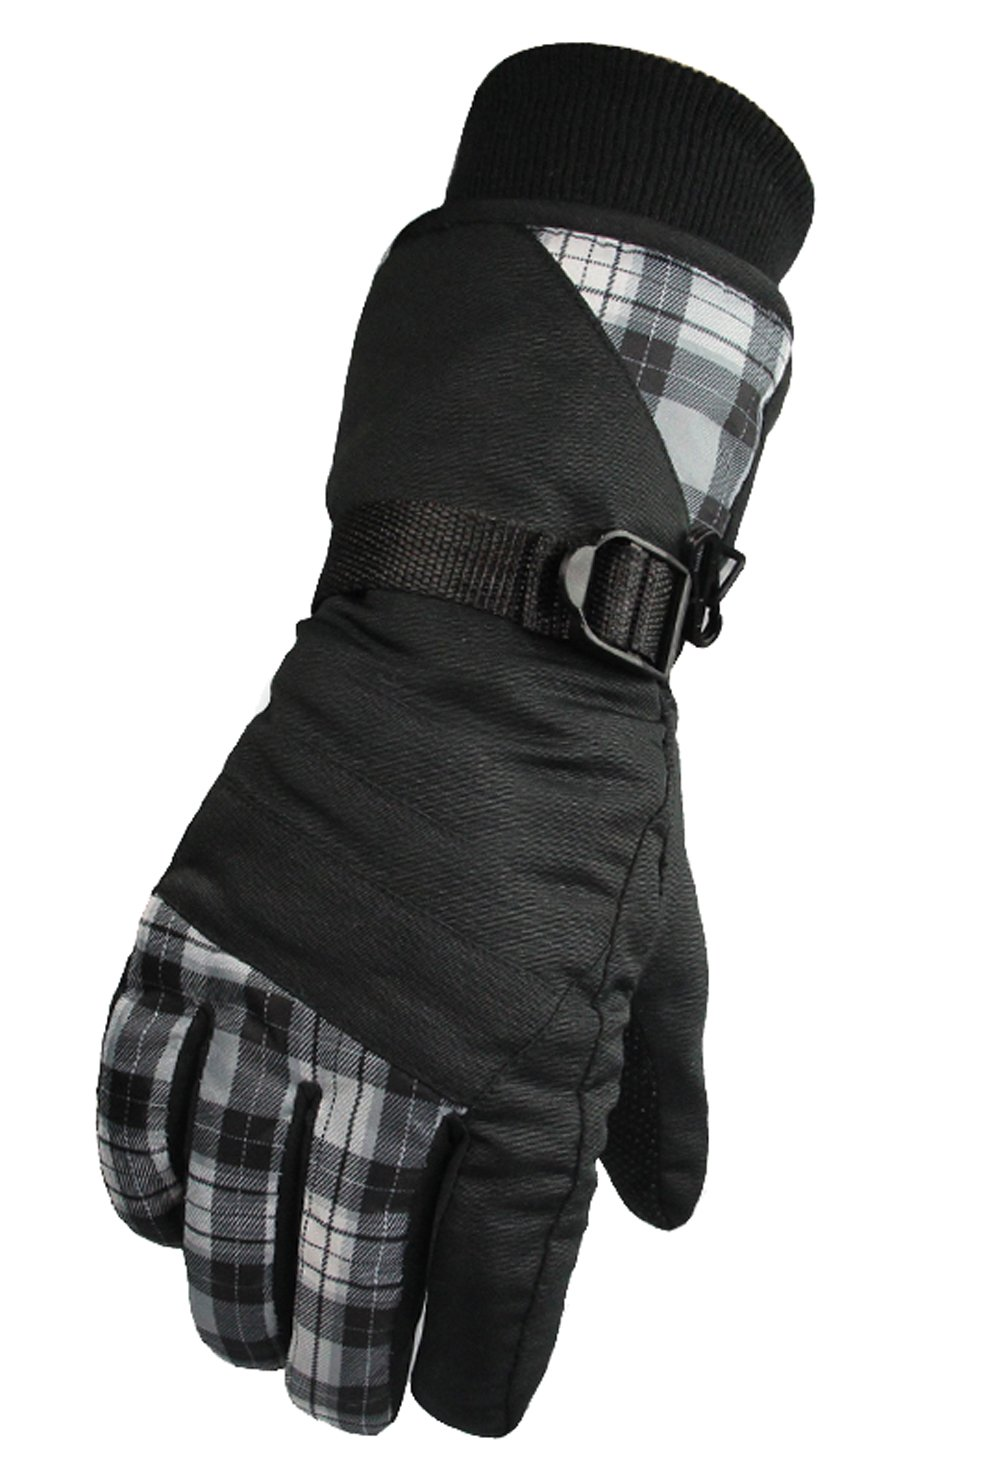 Runtlly Women's Outdoor Skiing Gloves Winter Warm Gloves Full Finger Waterproof Gloves Athletic Gloves